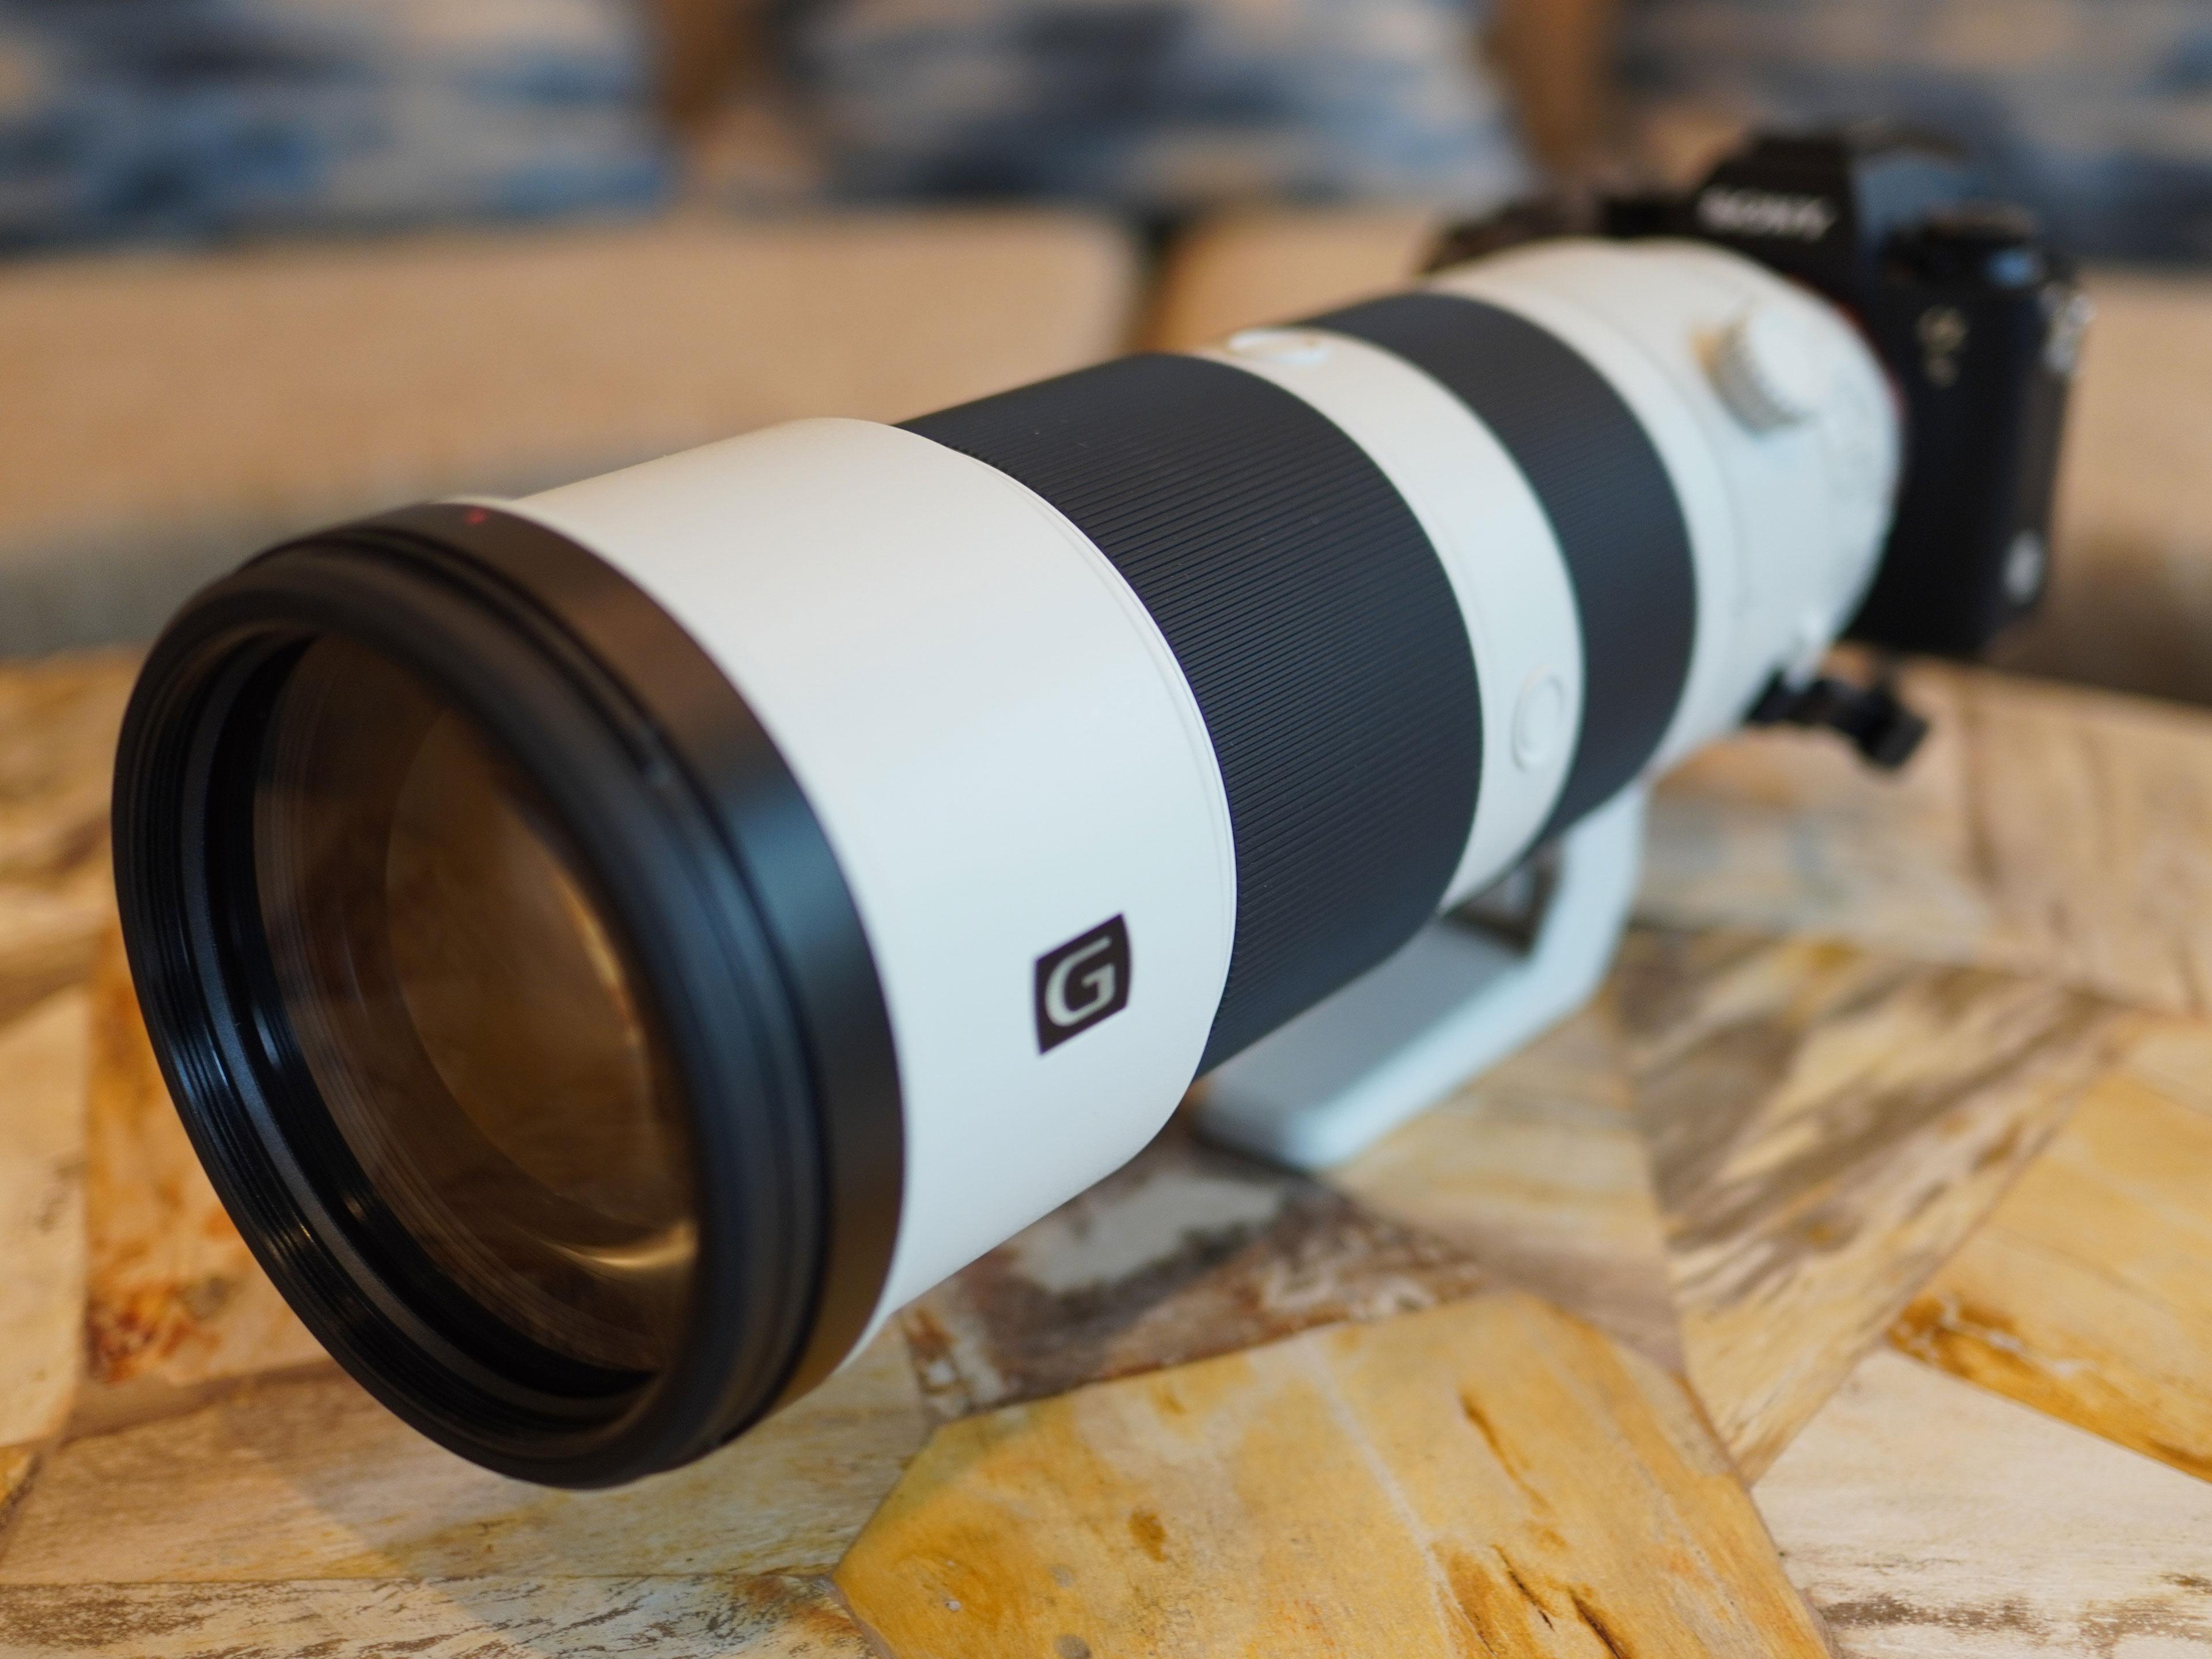 sony-fe-200-600mm-hero3